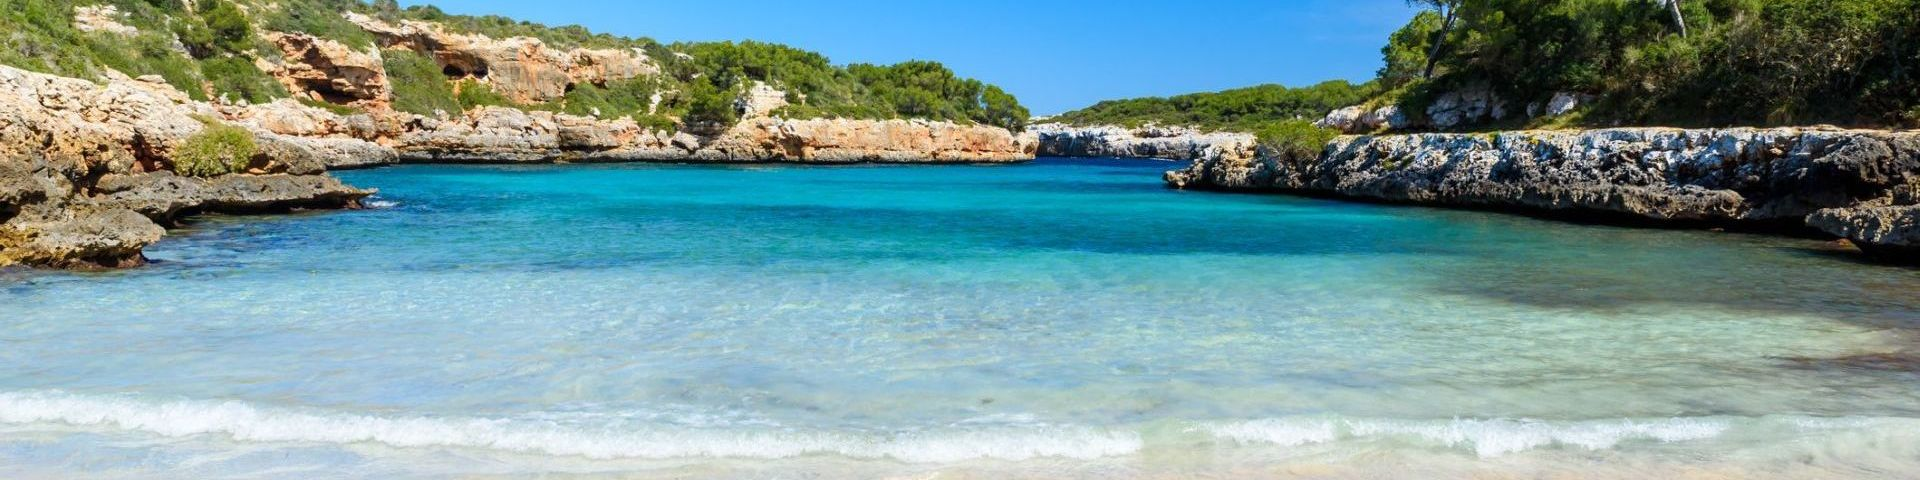 Mallorca - 4* Hotel inkl. Halbpension